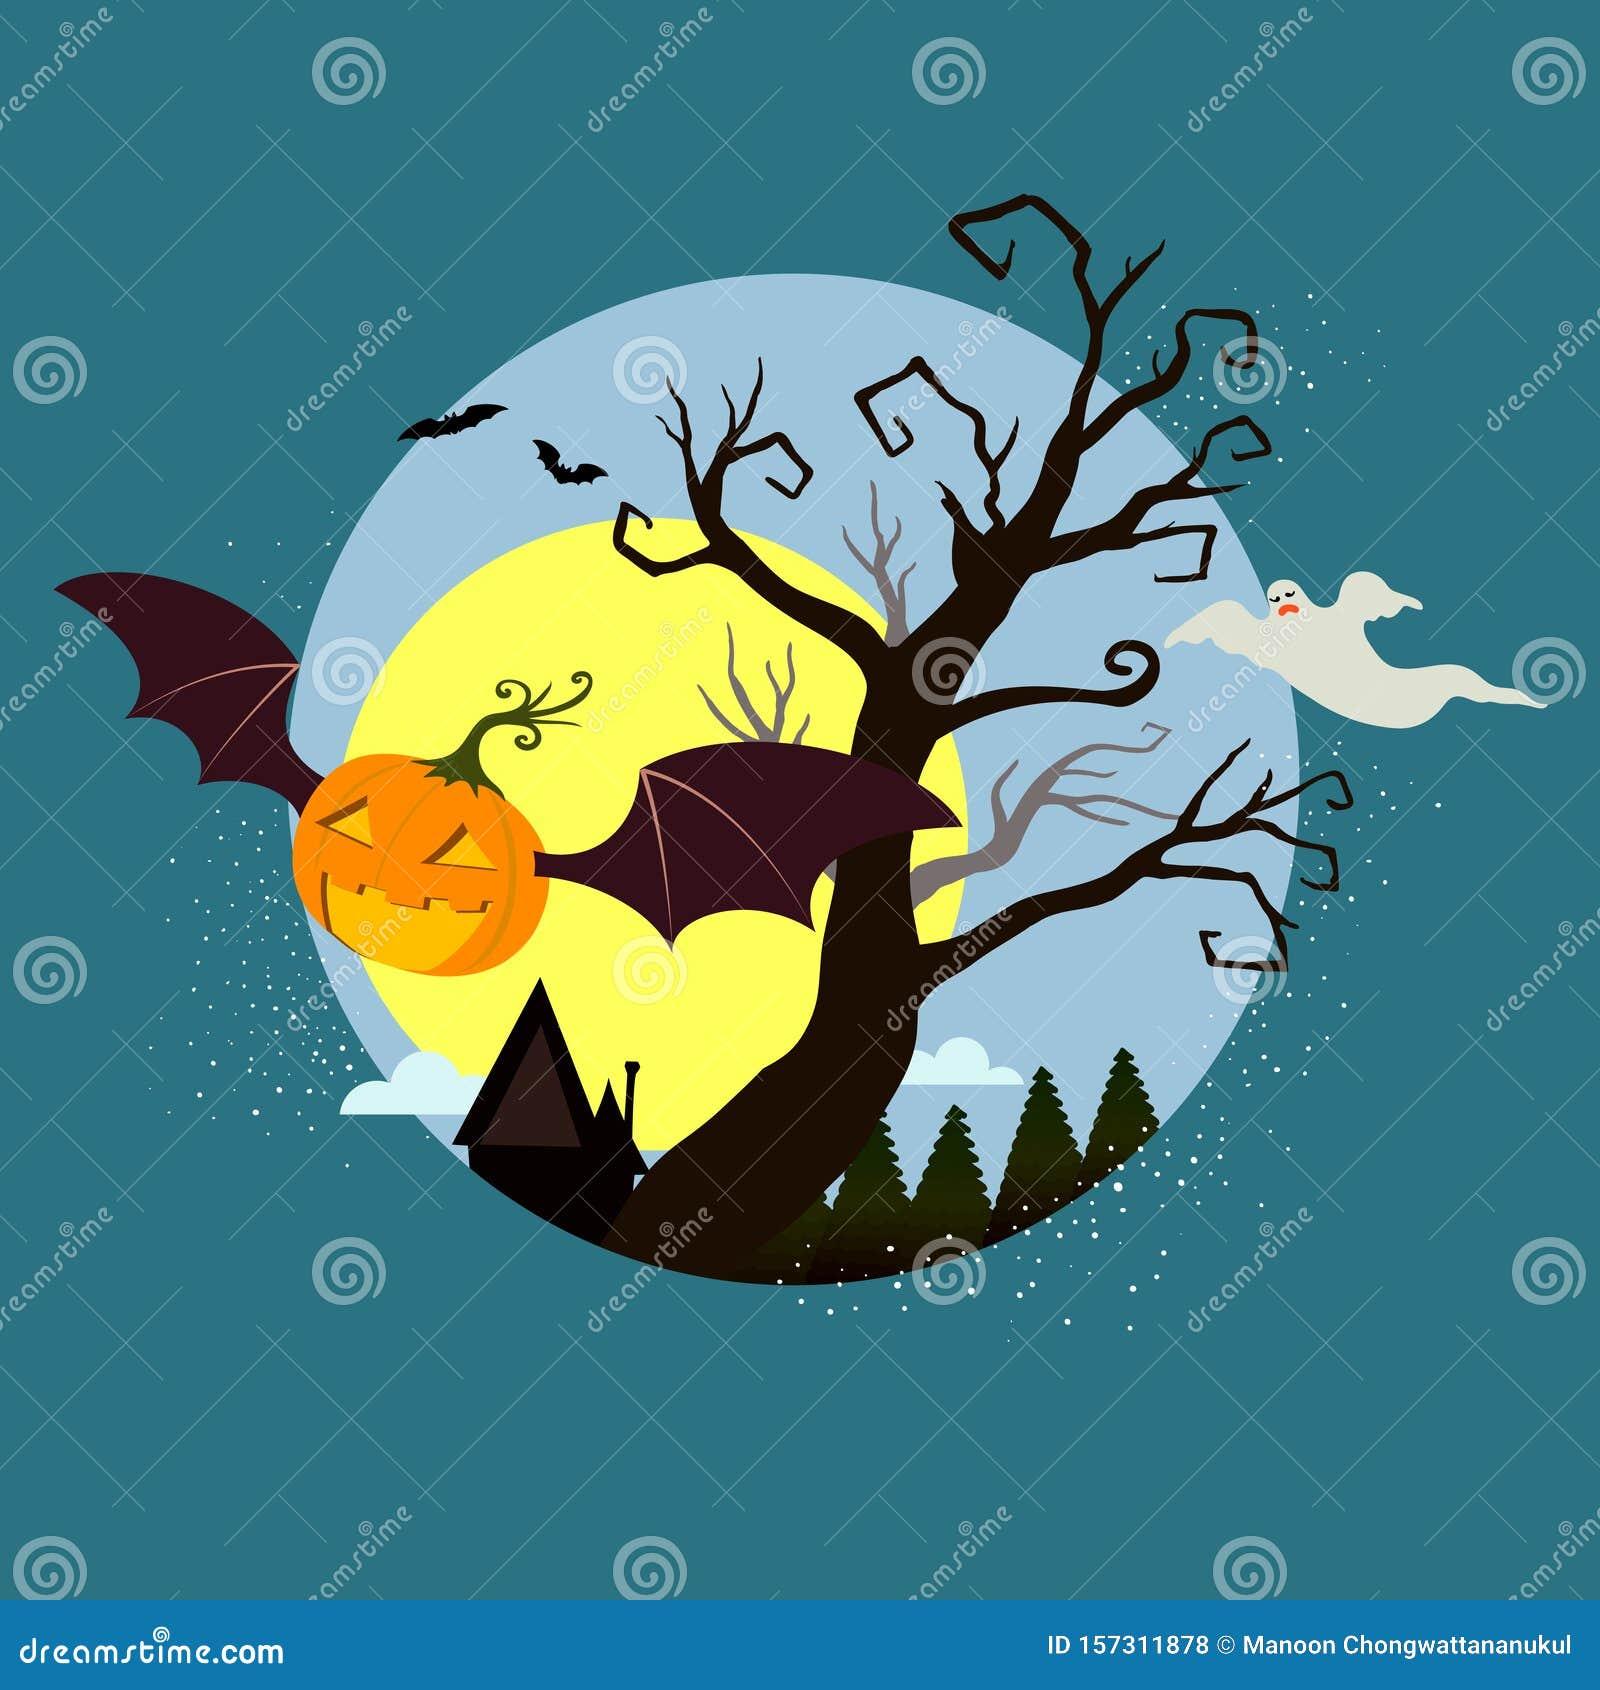 Halloween graphic design, illustration